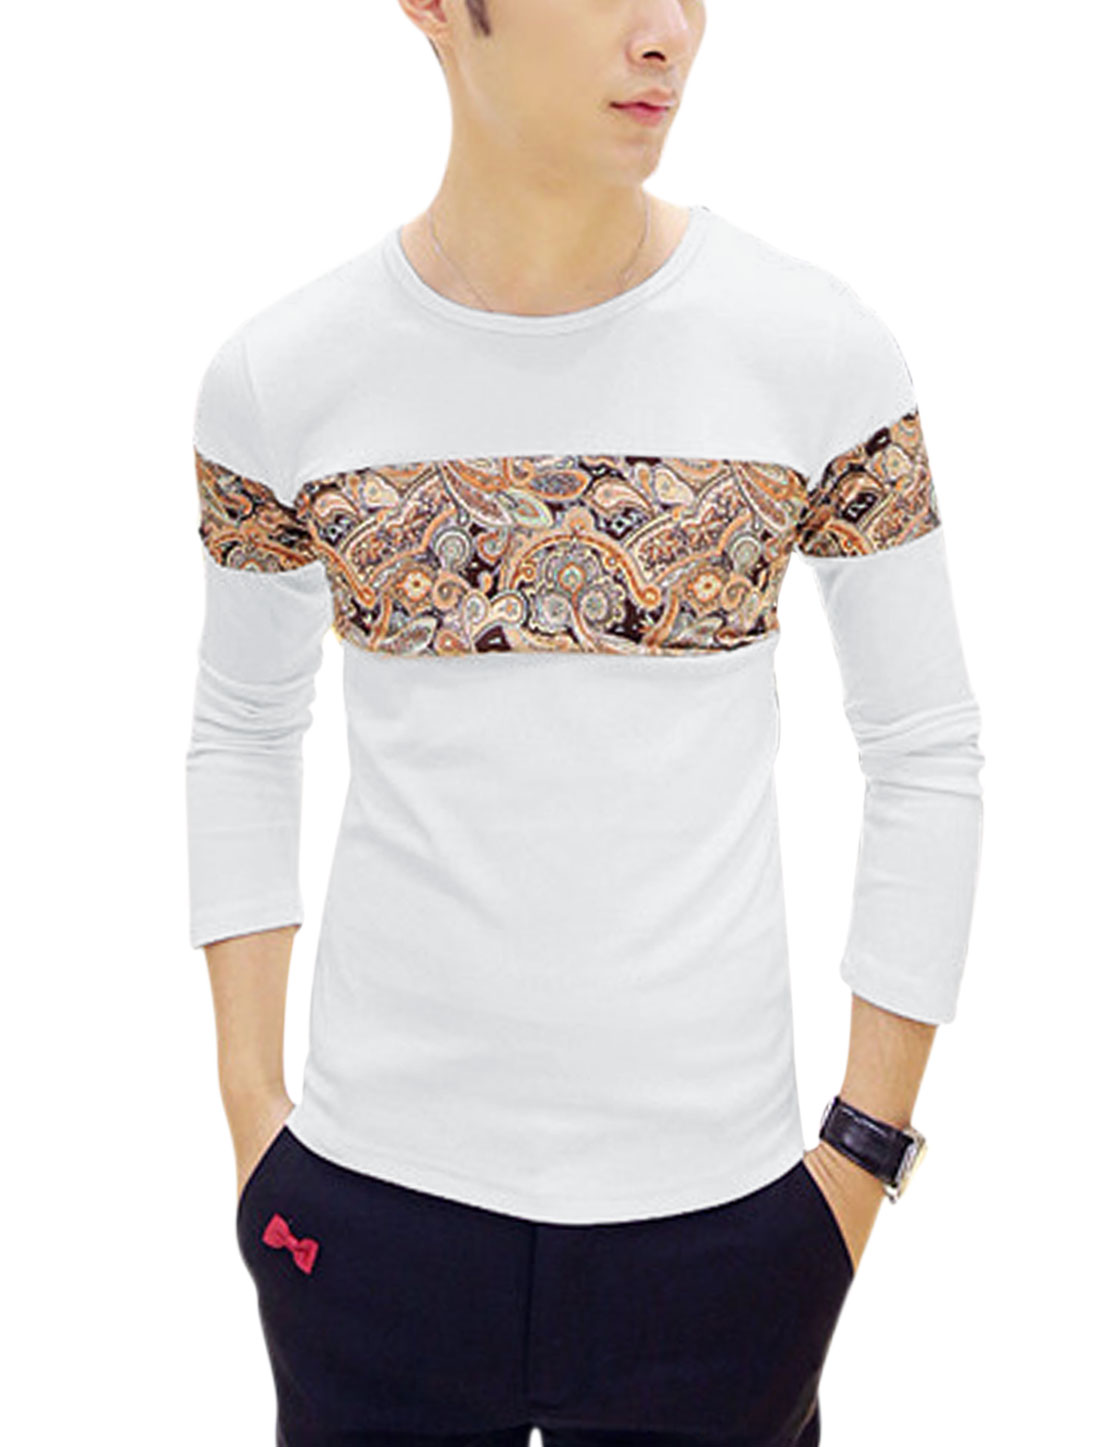 Men Contrast Paisleys Print Panel Casual T-Shirt White S